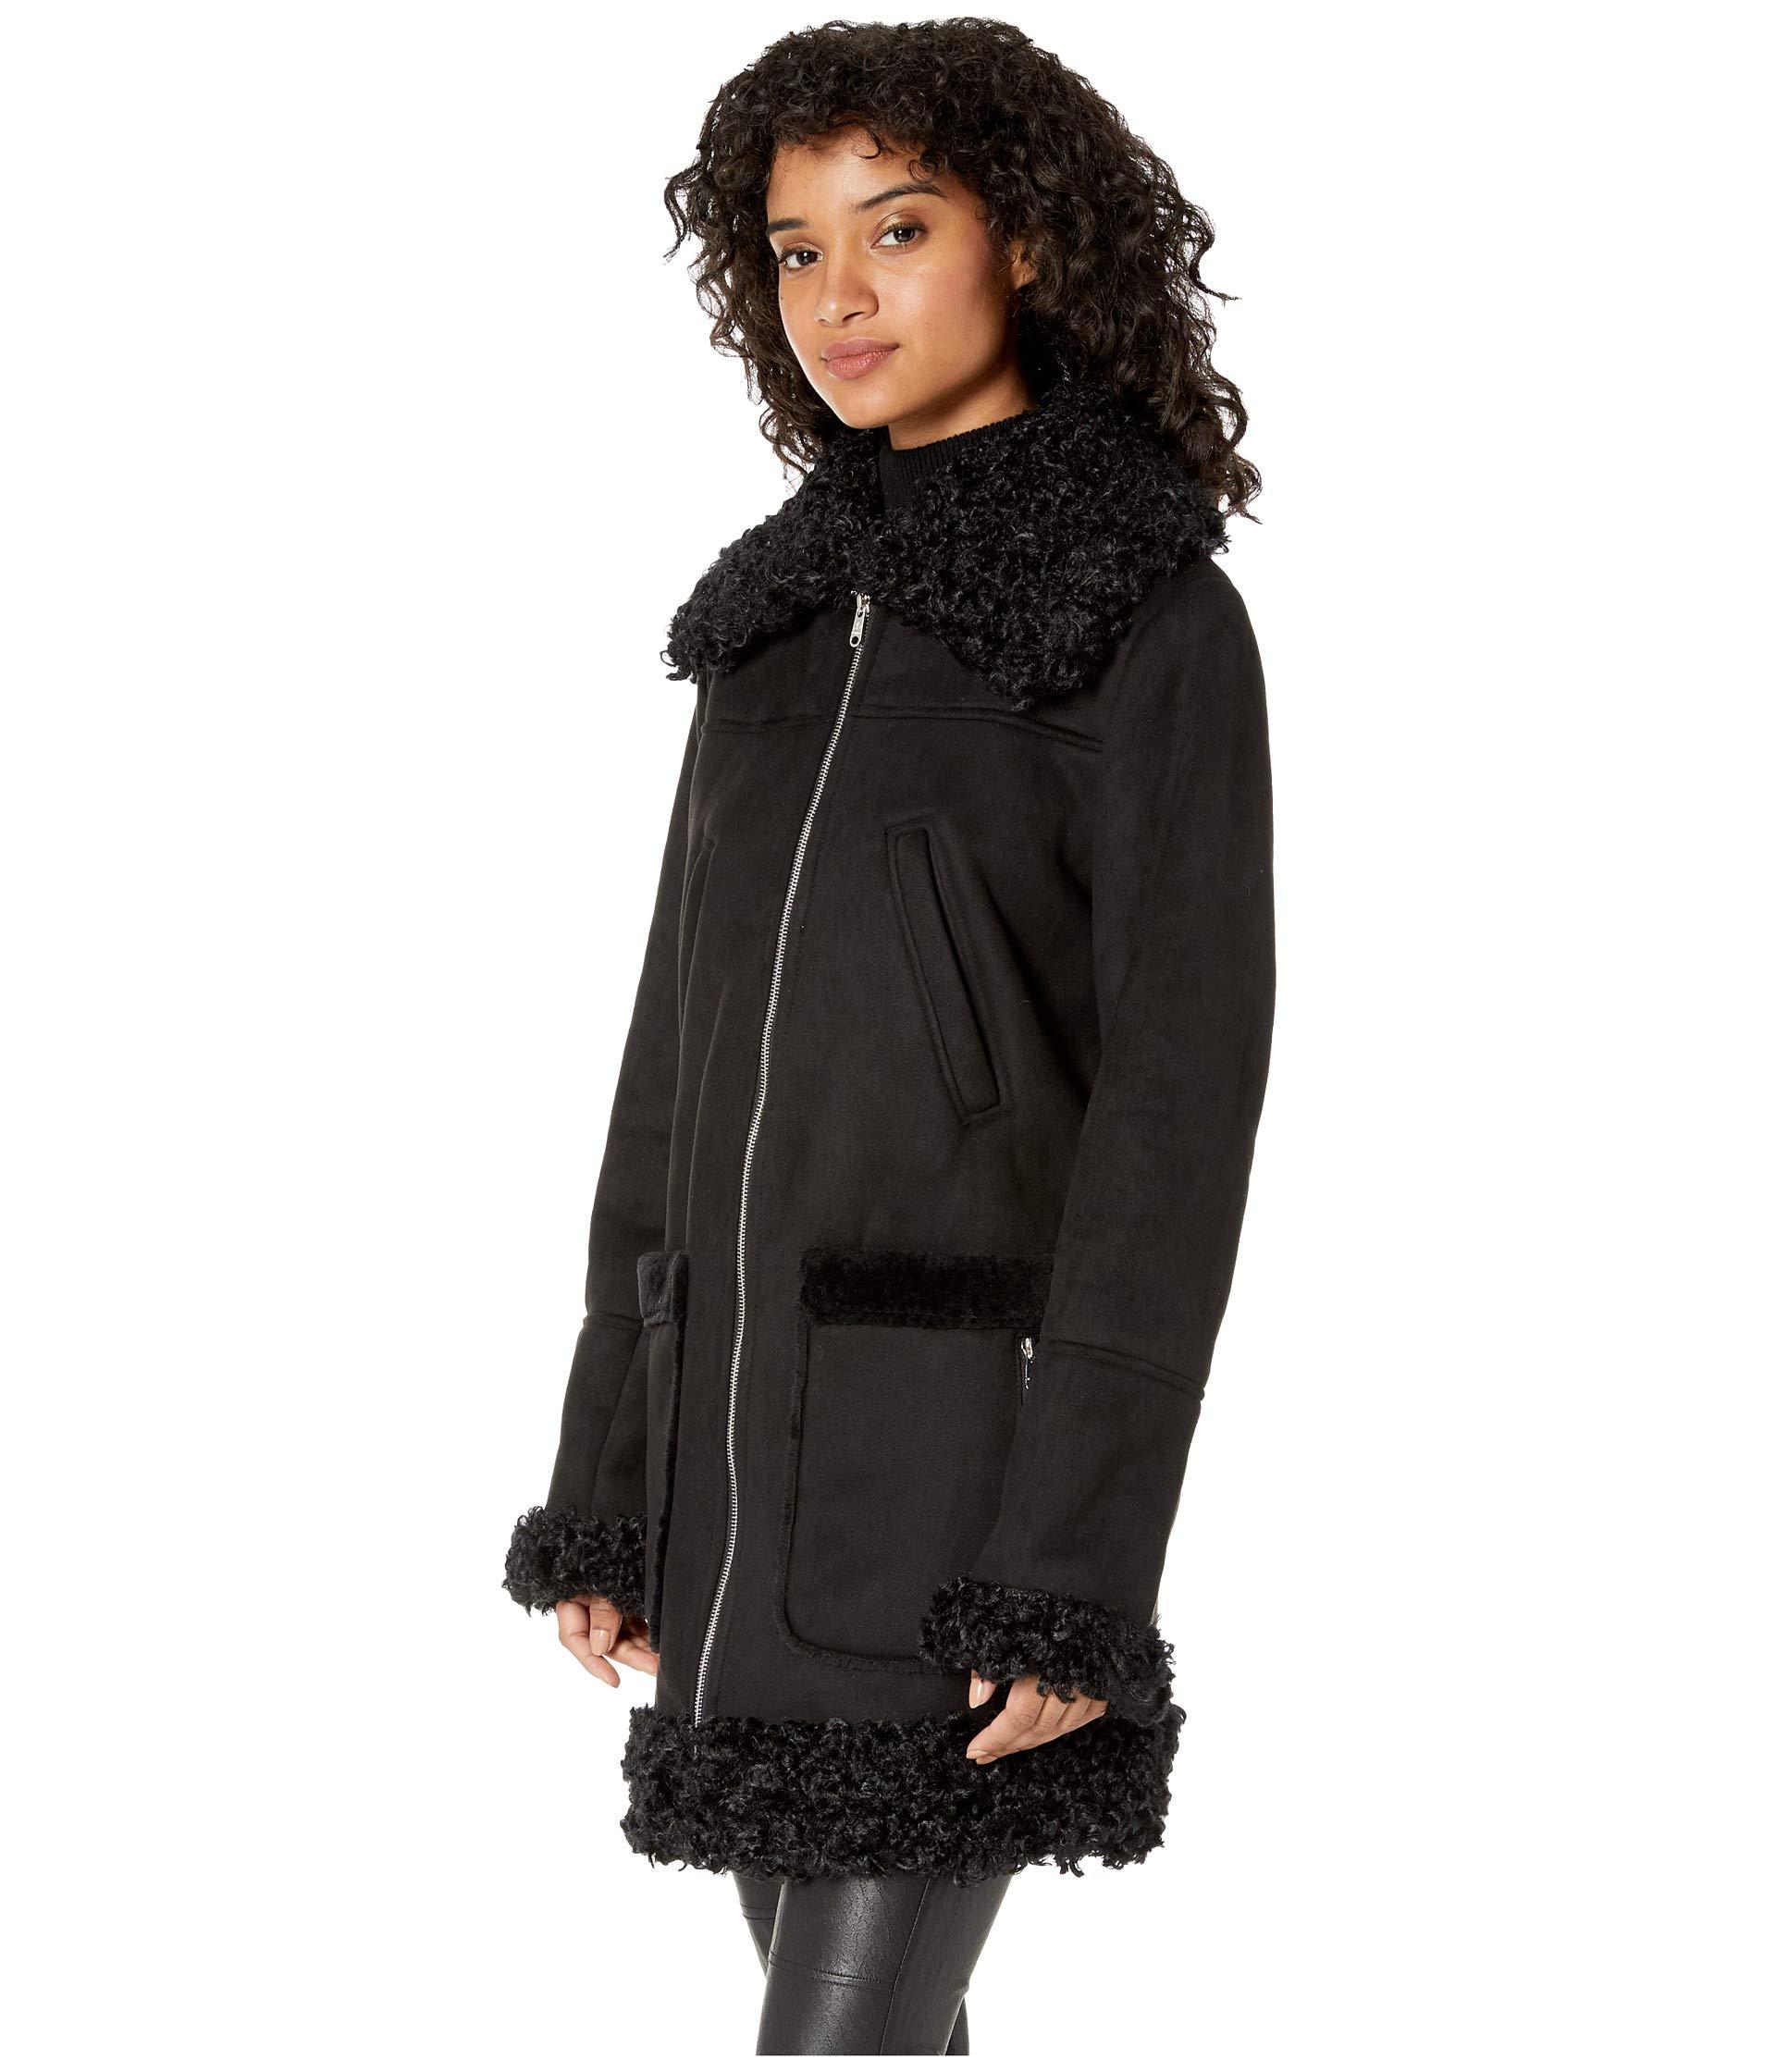 Sam Coat Edelman Faux Shearling 3 4 Black wngFxqw6Ap